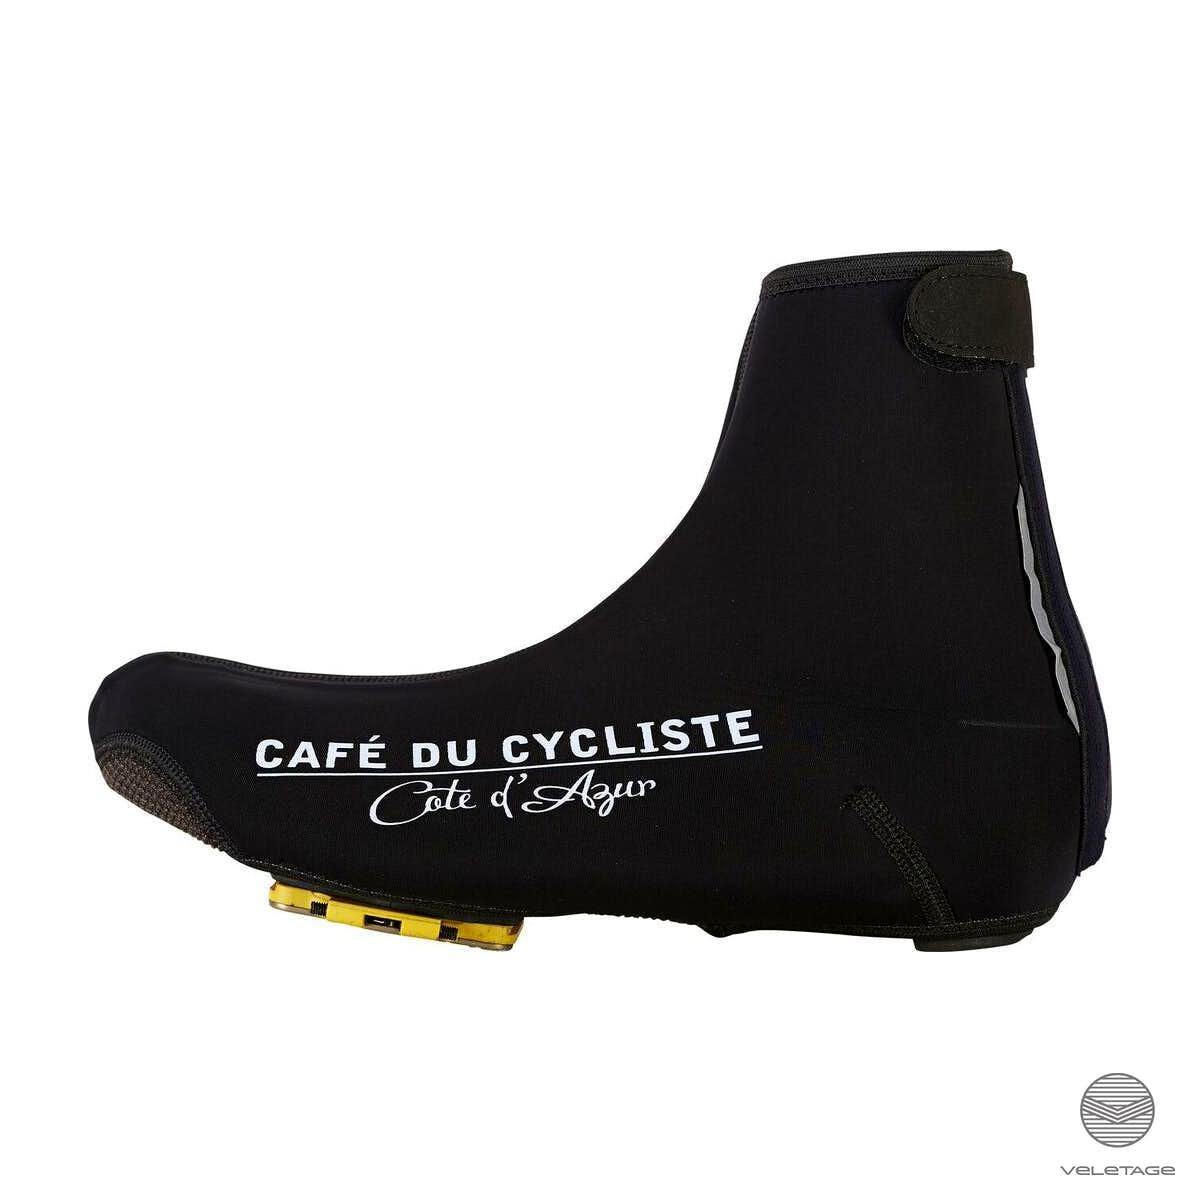 06c1a43b3 Cafe du Cycliste ▷ WINTER Shoe Cover - Schwarz - veletage Wien